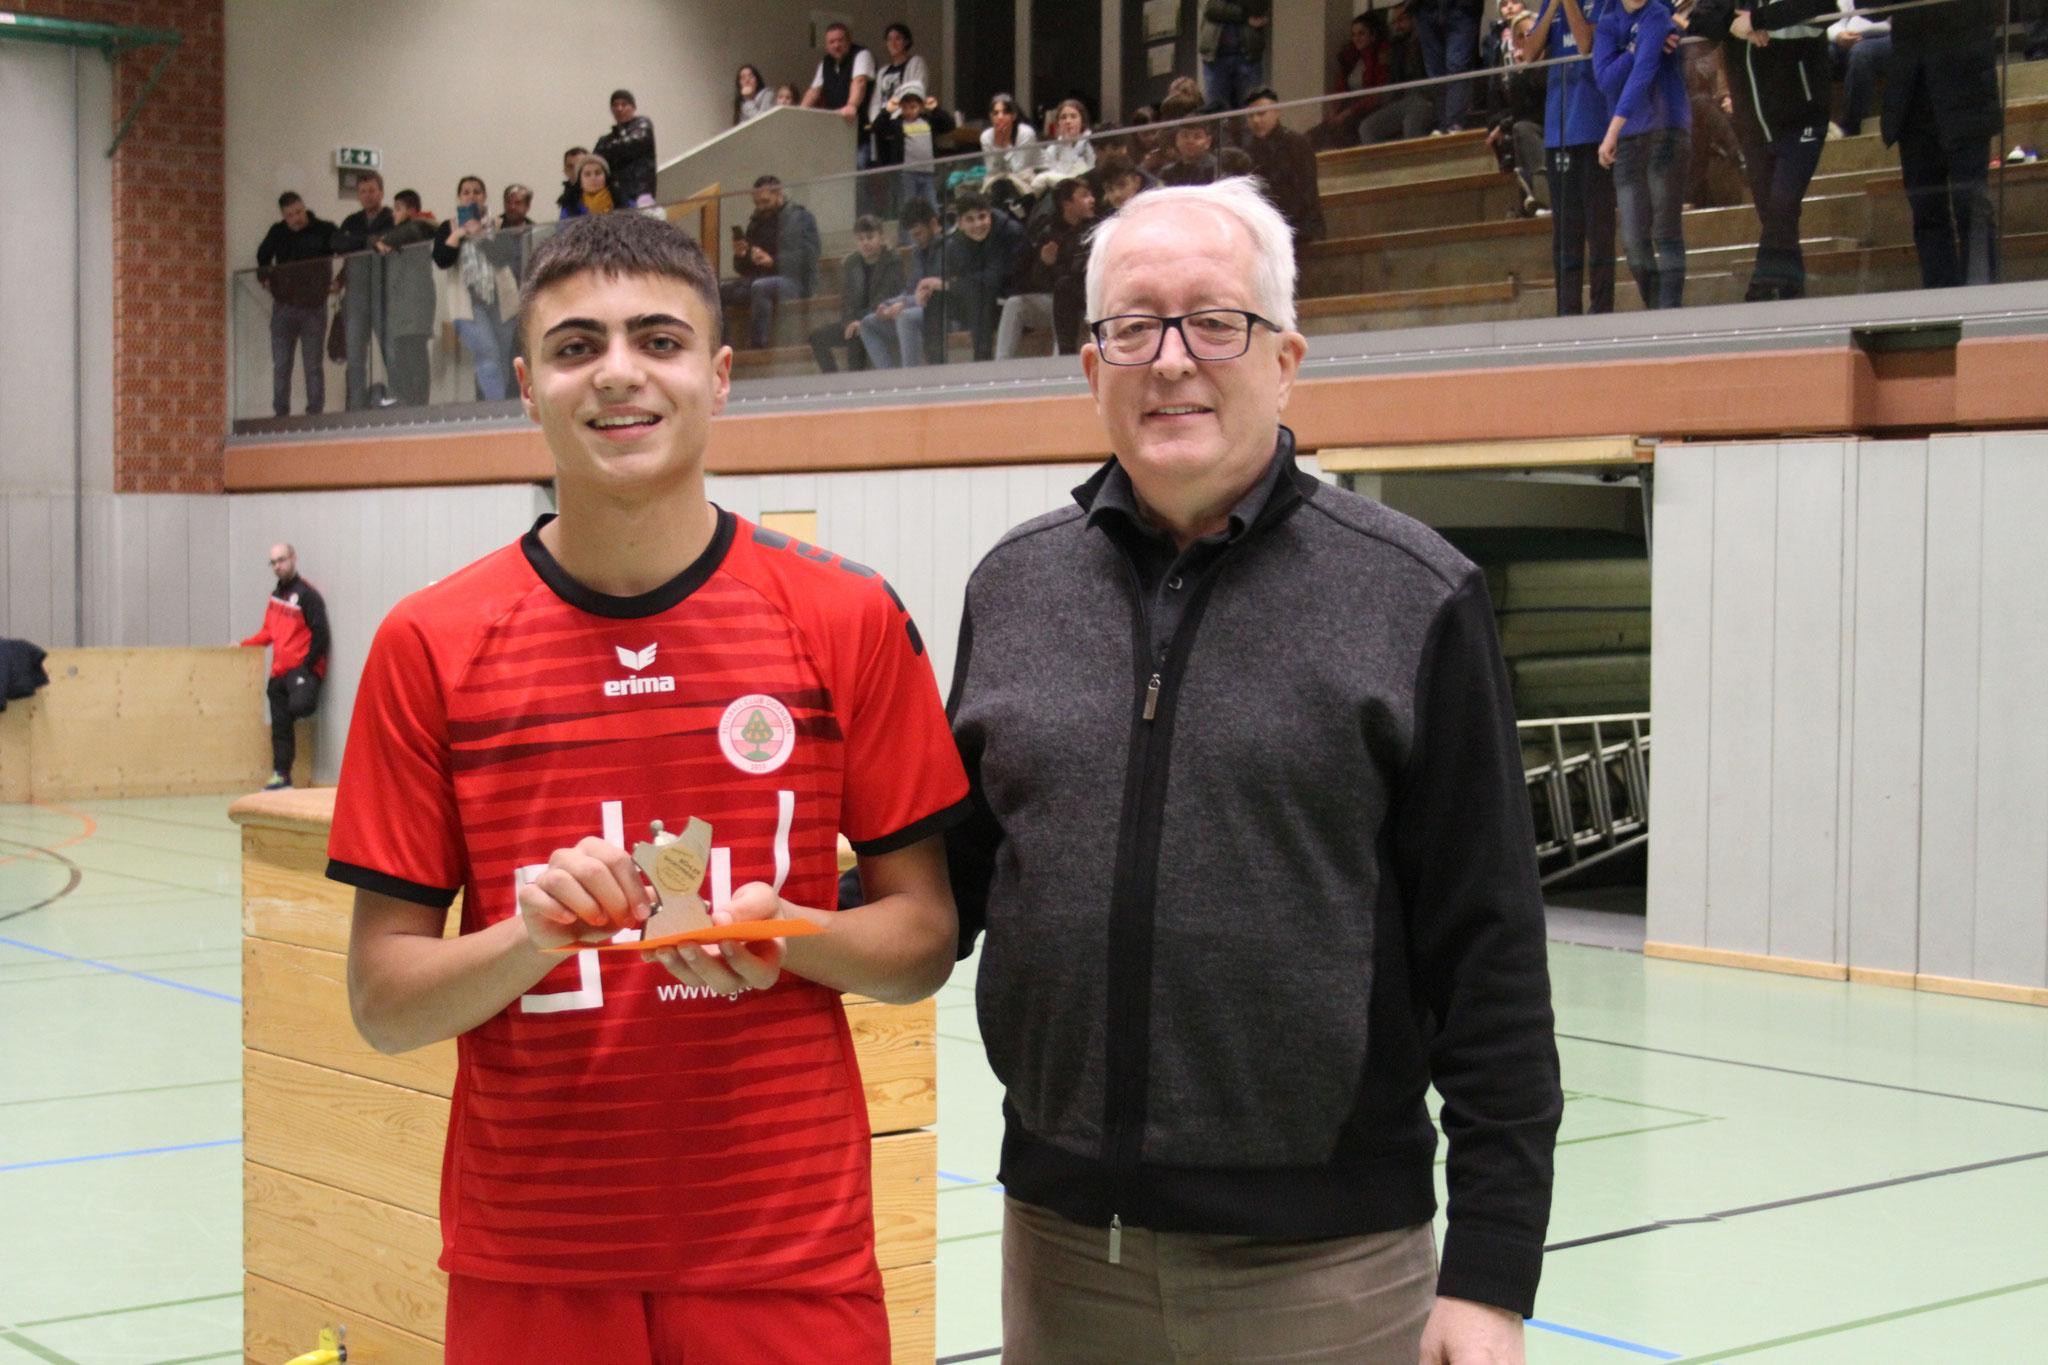 Bester Spieler - Bekem Bicki (FC Dornbirn)